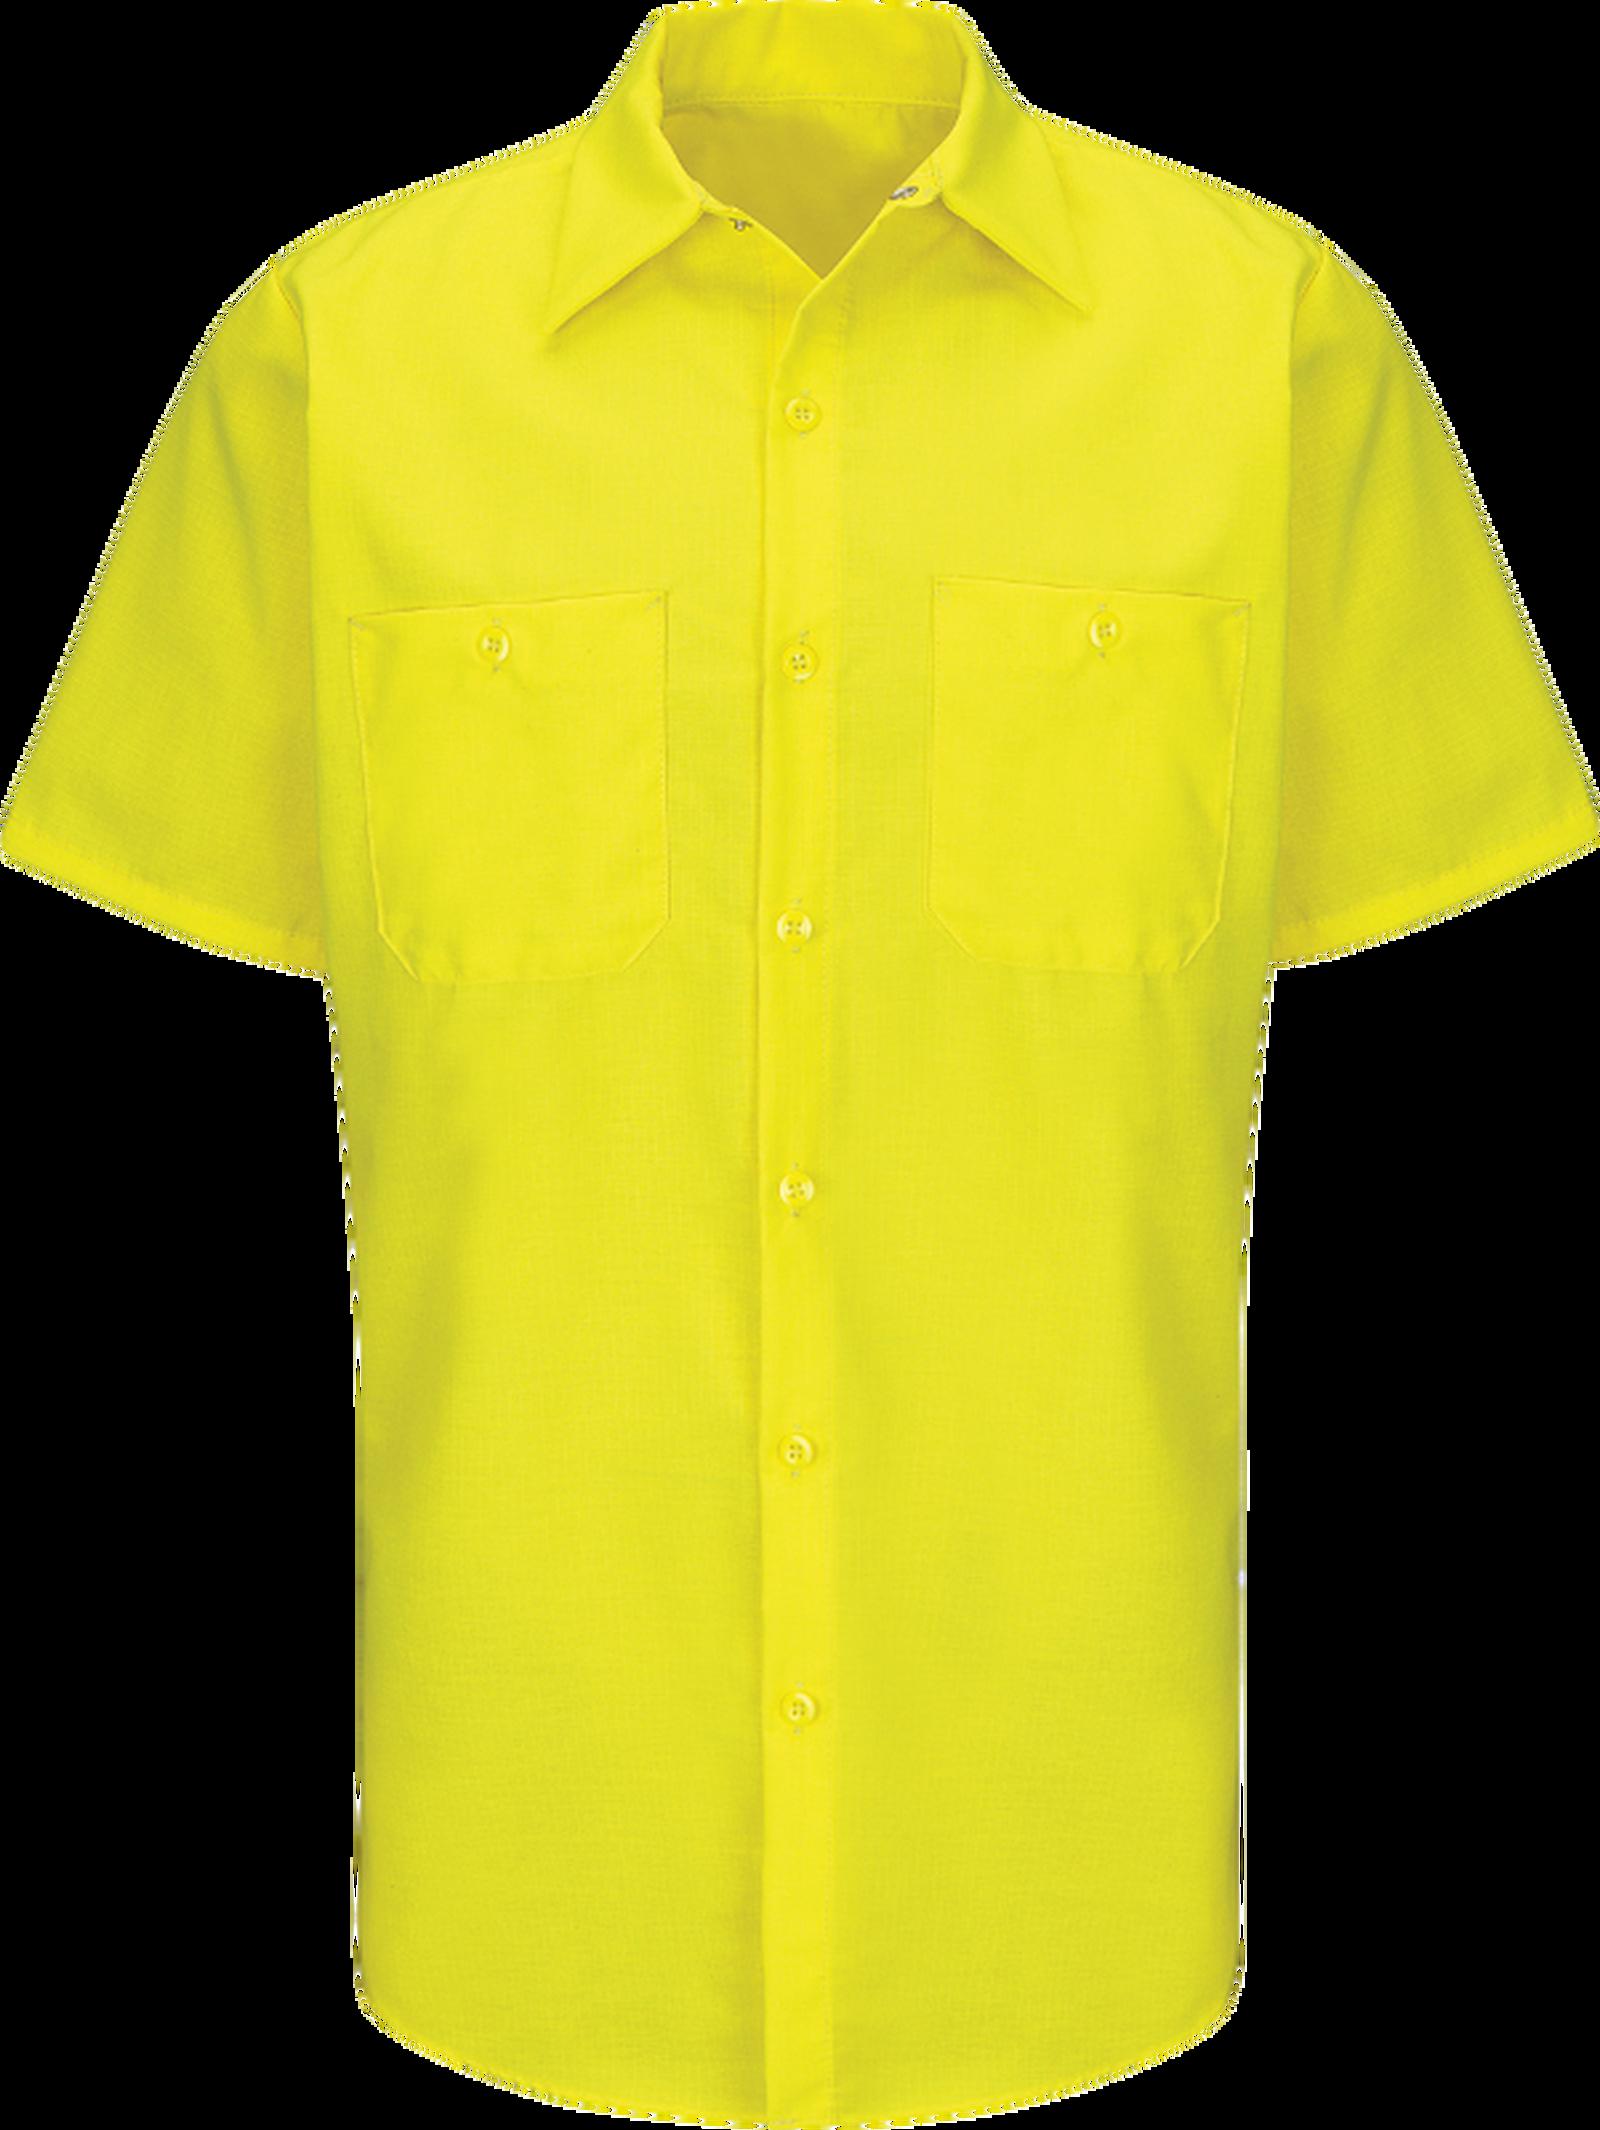 Short Sleeve Enhanced Visibility Ripstop Work Shirt